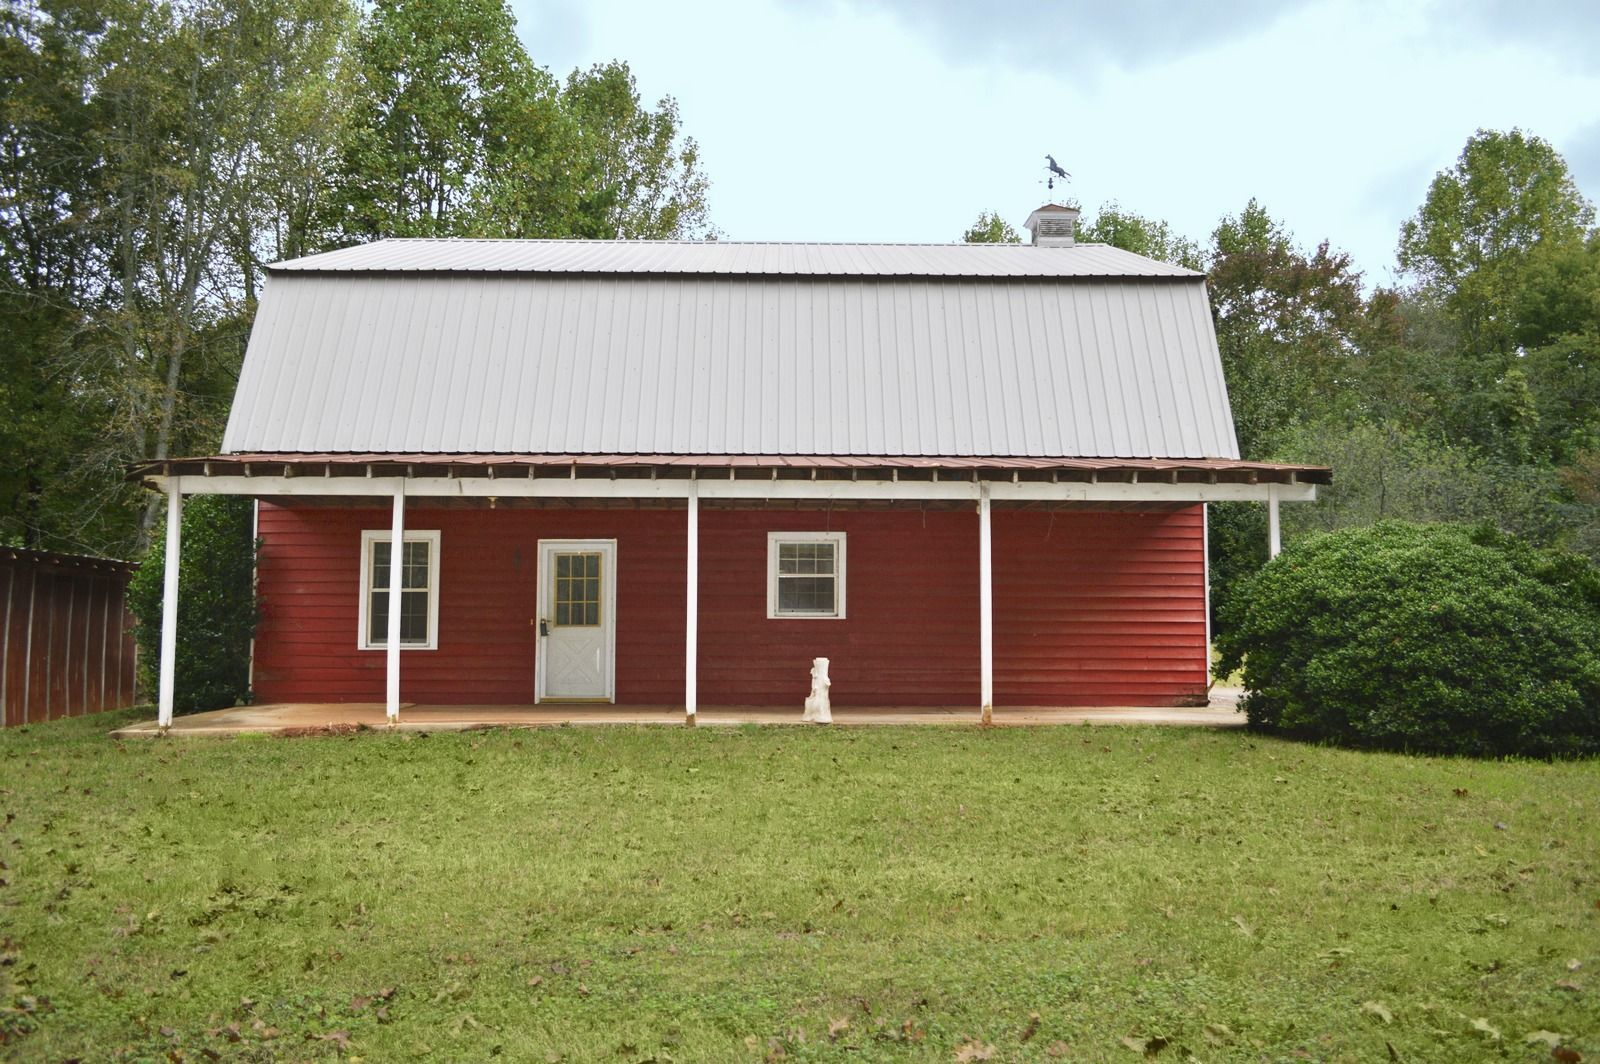 6 barn homes for sale across america barns for sale for Barn homes kits for sale